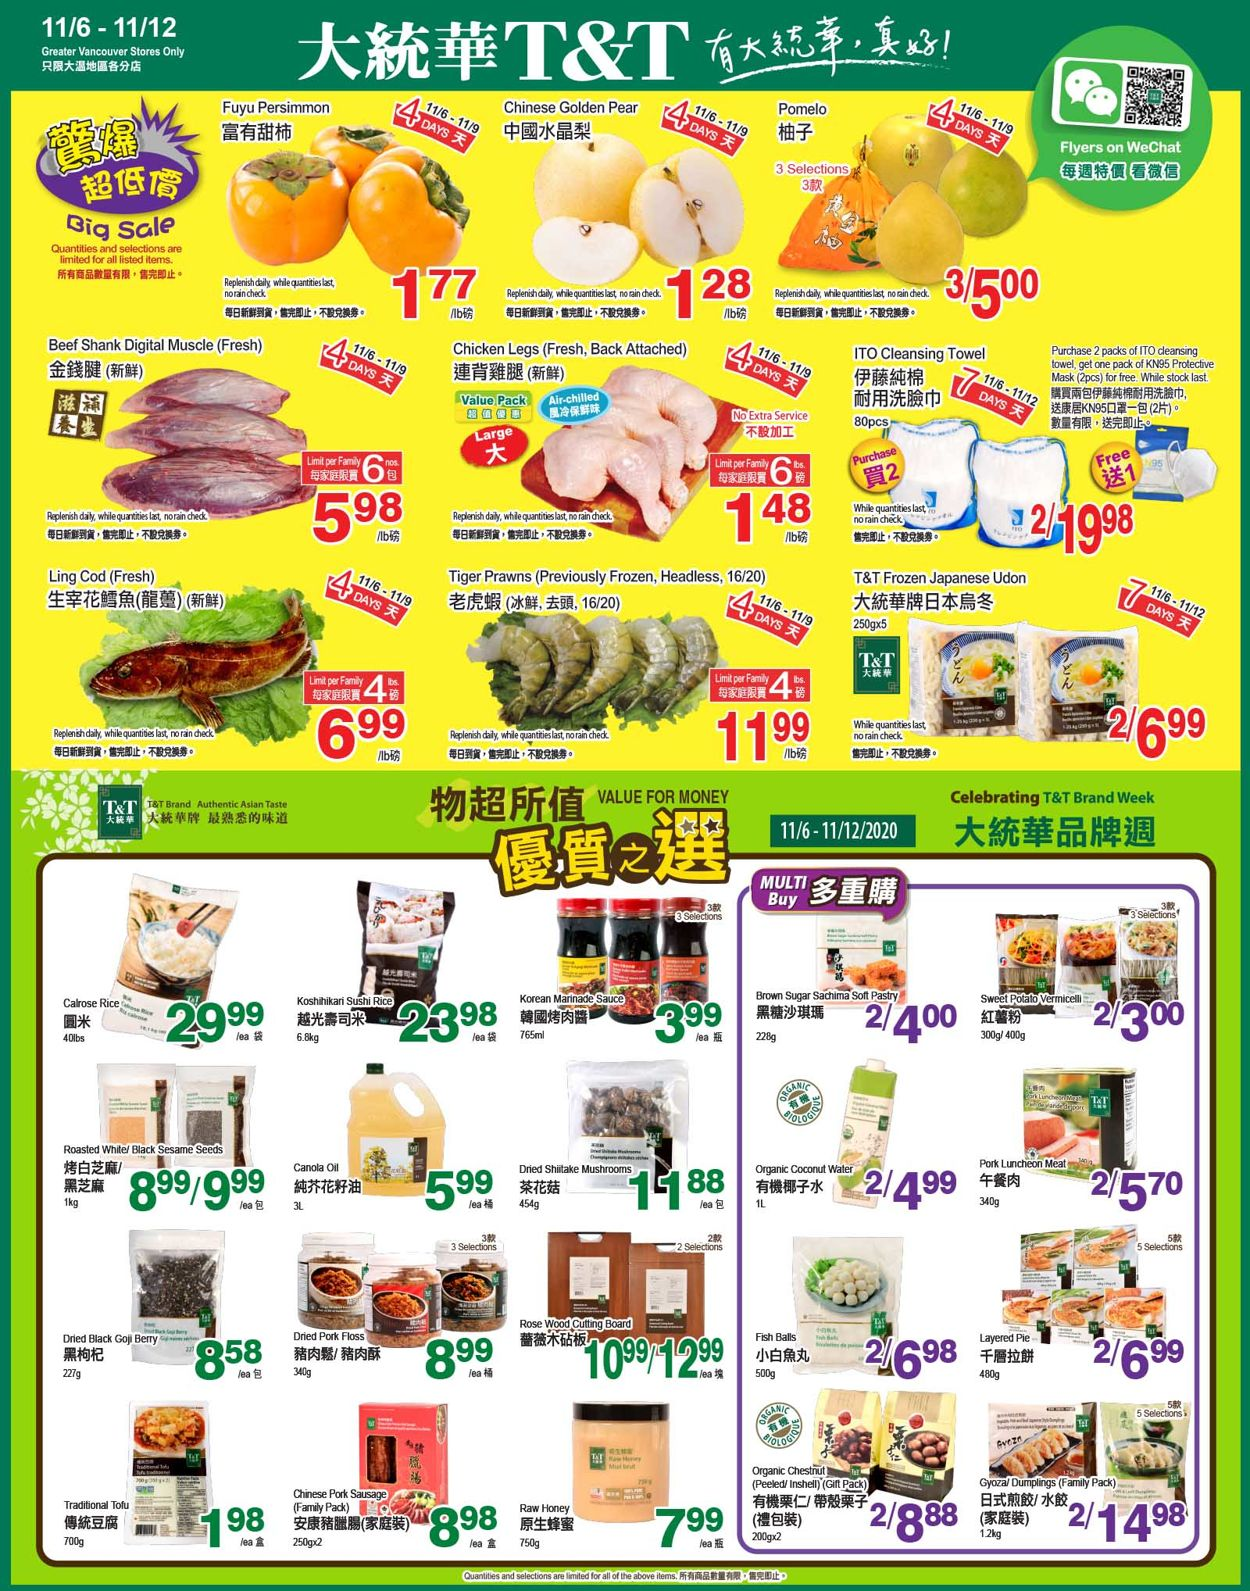 T&T Supermarket - British Columbia Flyer - 11/06-11/12/2020